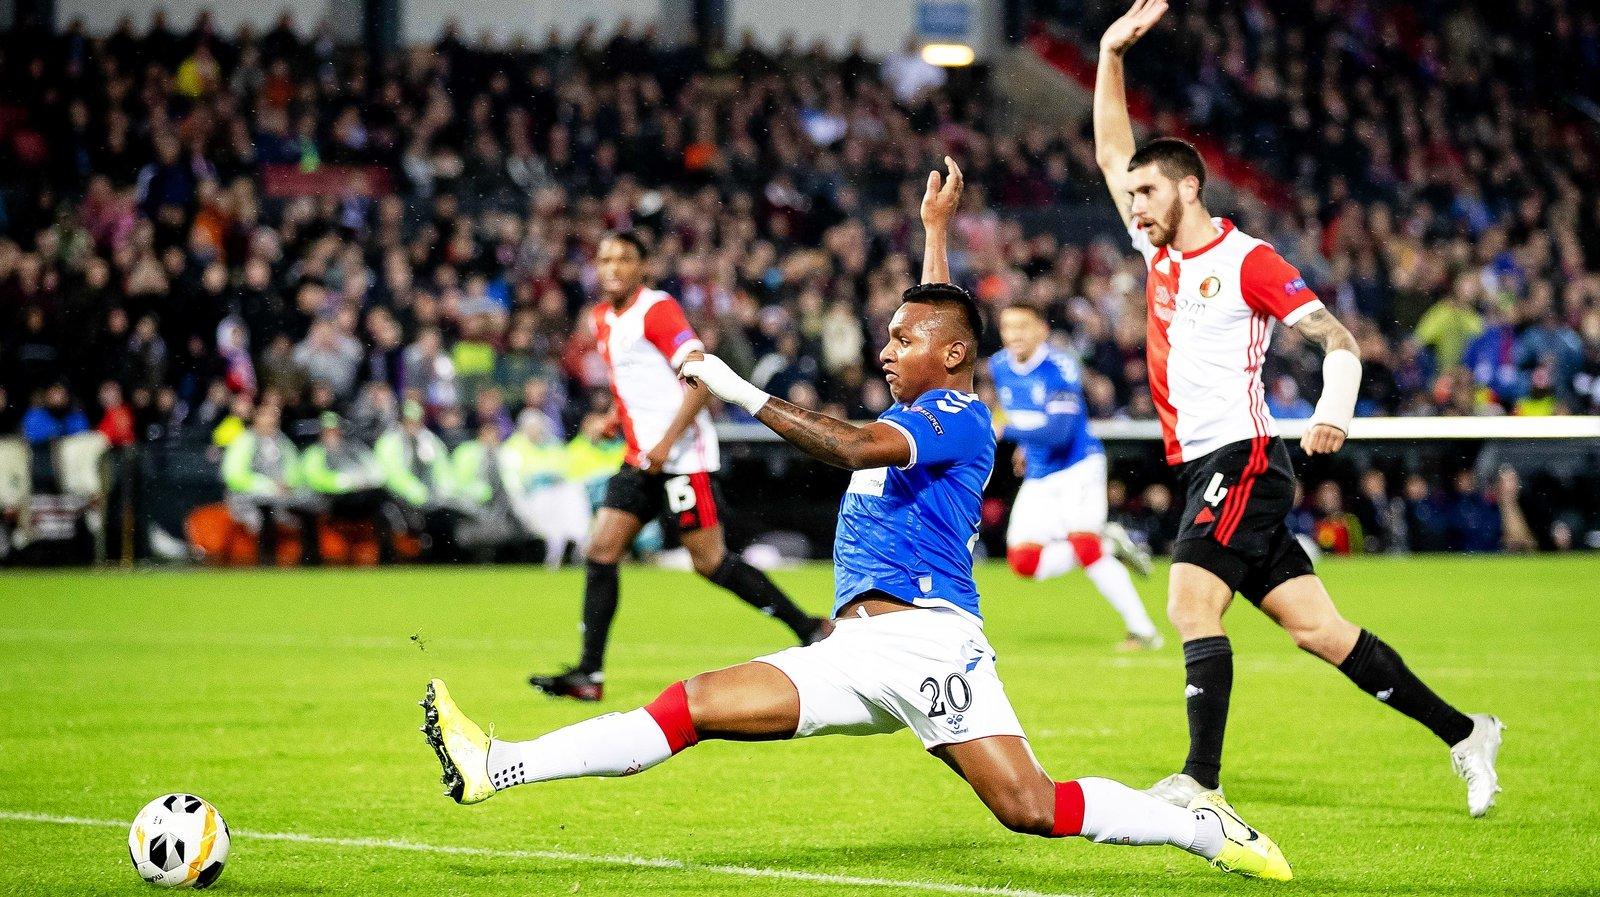 Morelos sets Rangers record in draw against Feyenoord